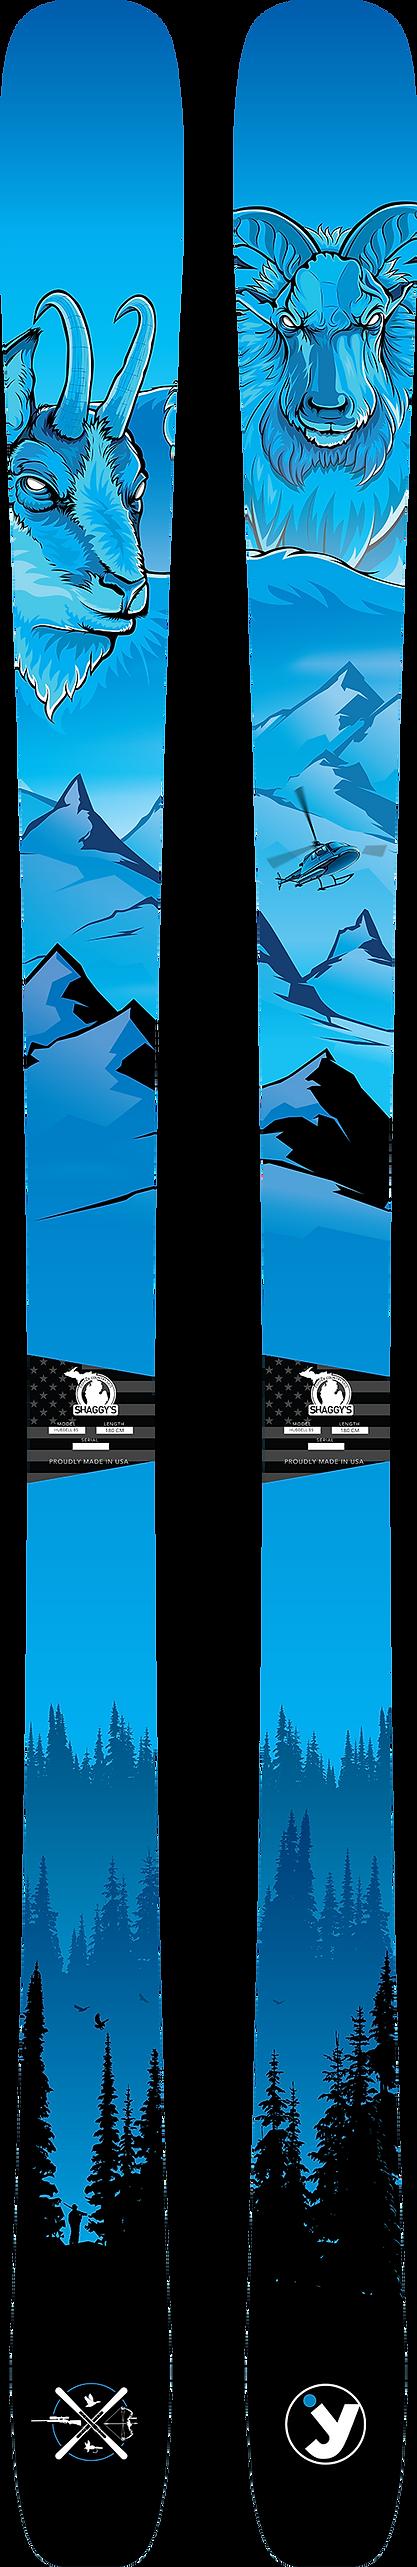 jimcreates-shaggy-skis.png